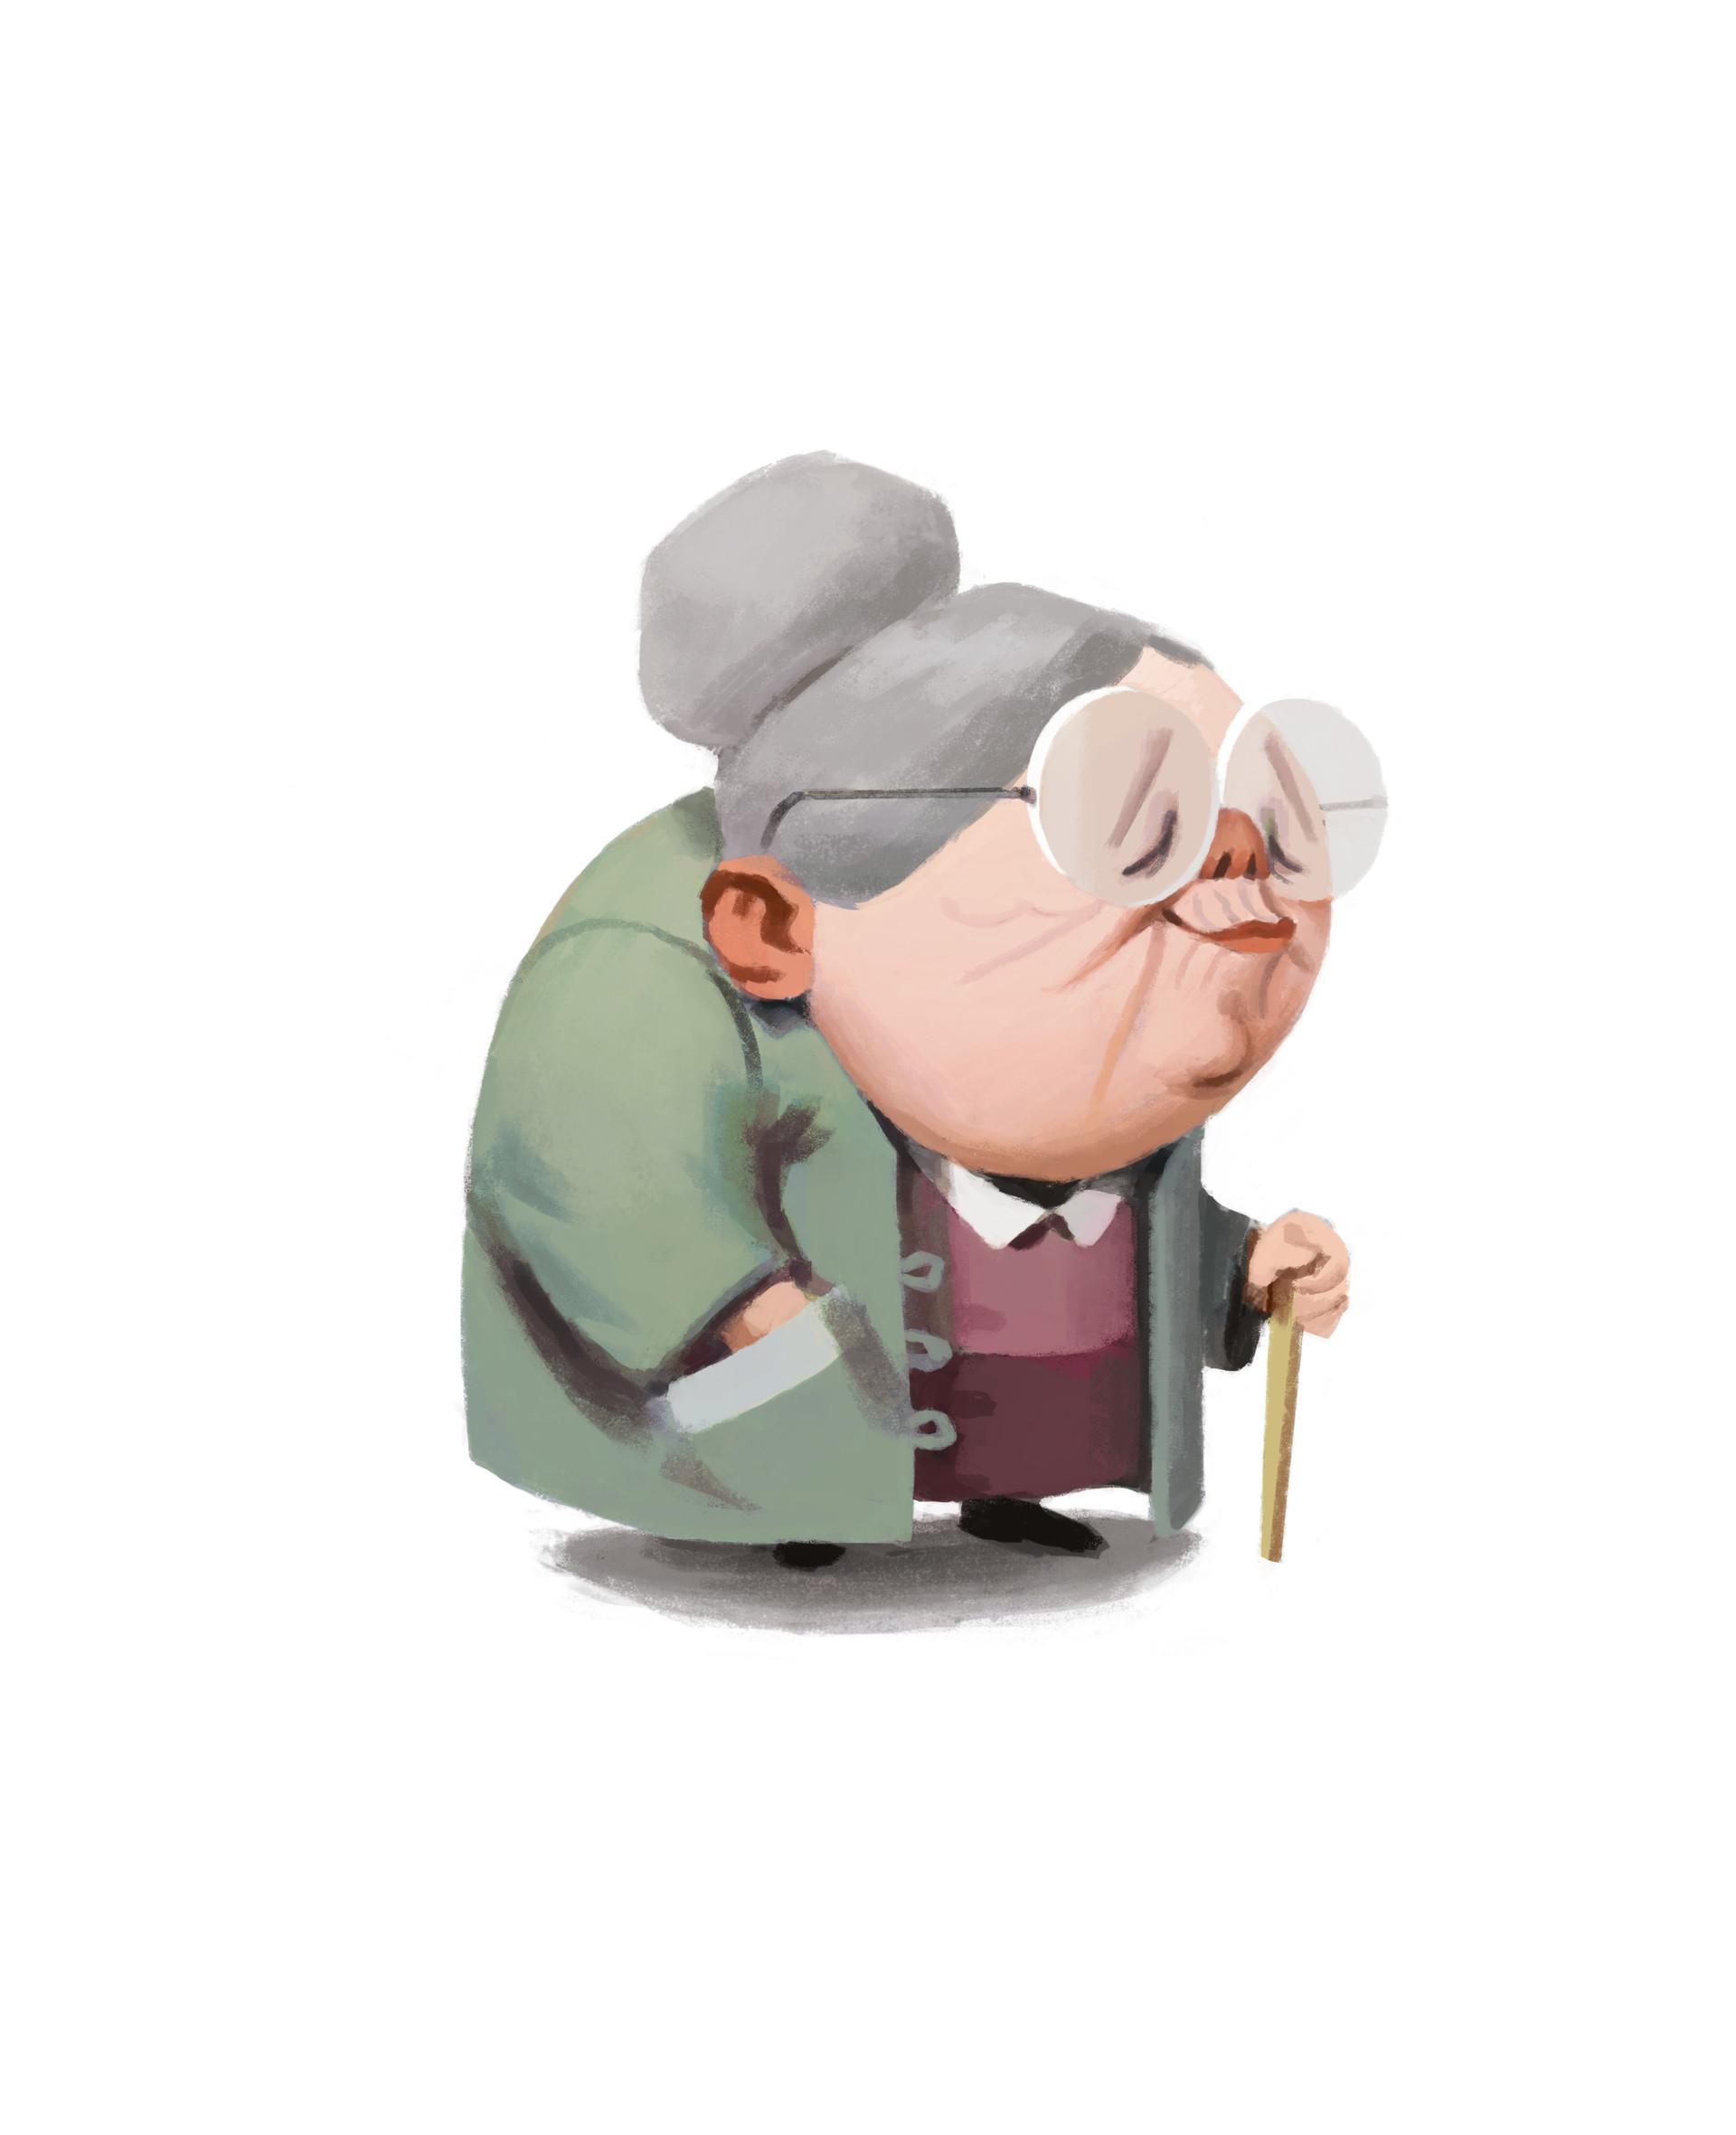 Jens claessens psyop grandmascats grandma